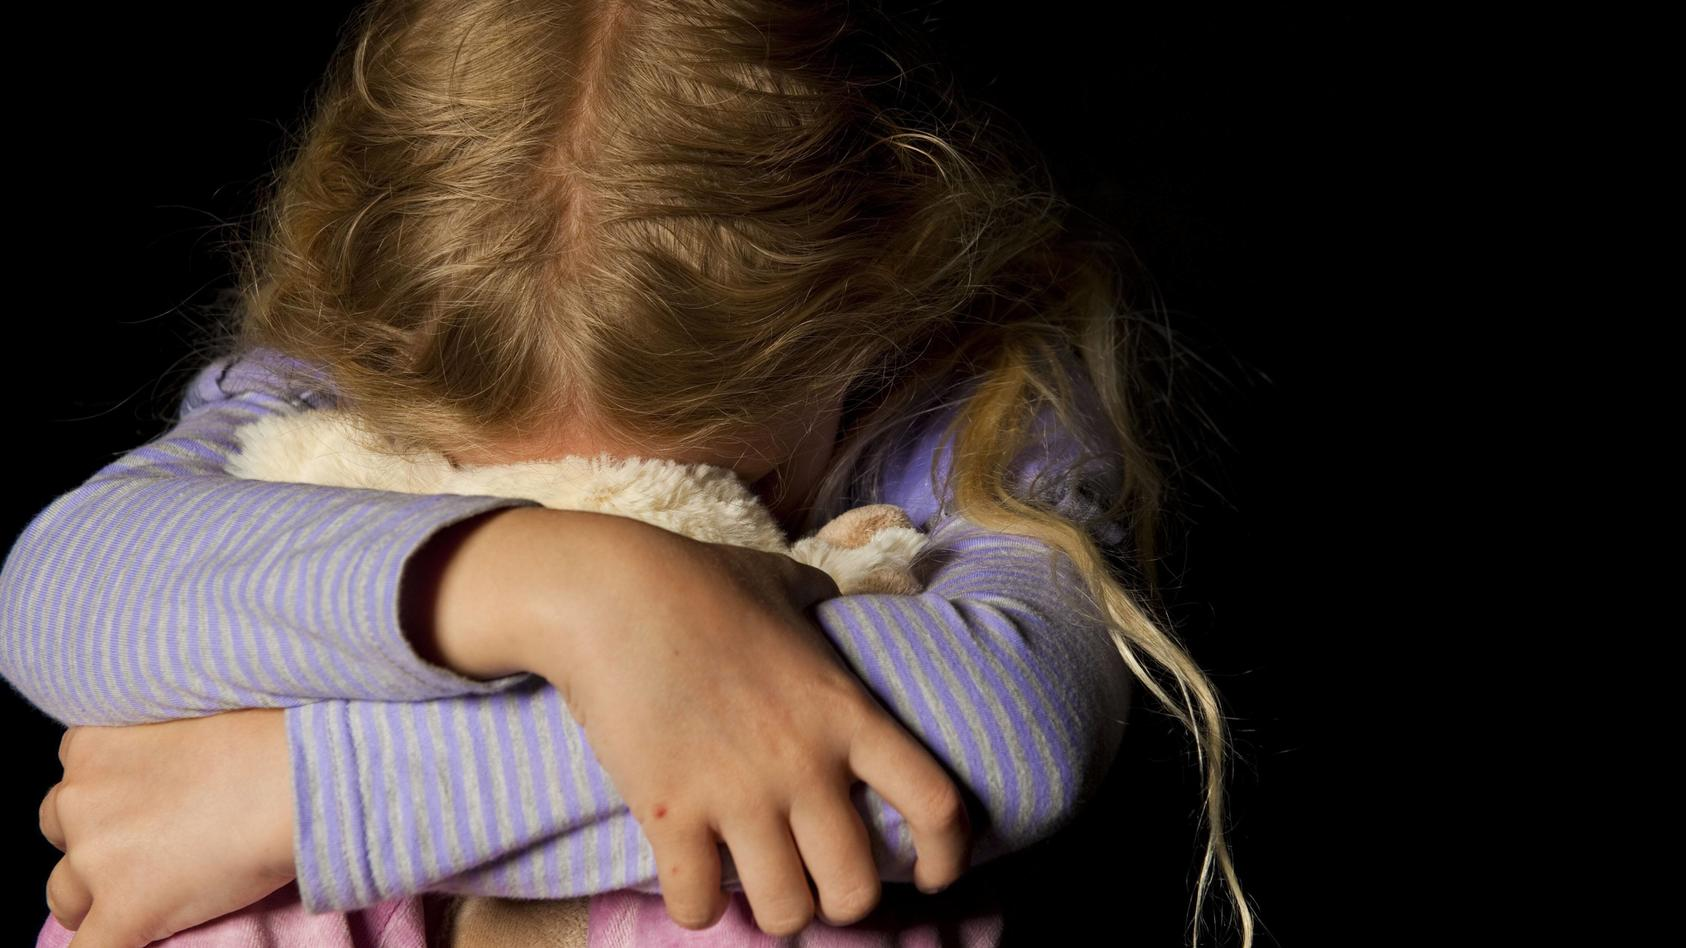 Mädchen kauert Symbolbild Kindesmissbrauch symbolic for child assault BLWX095907 Copyright xblic